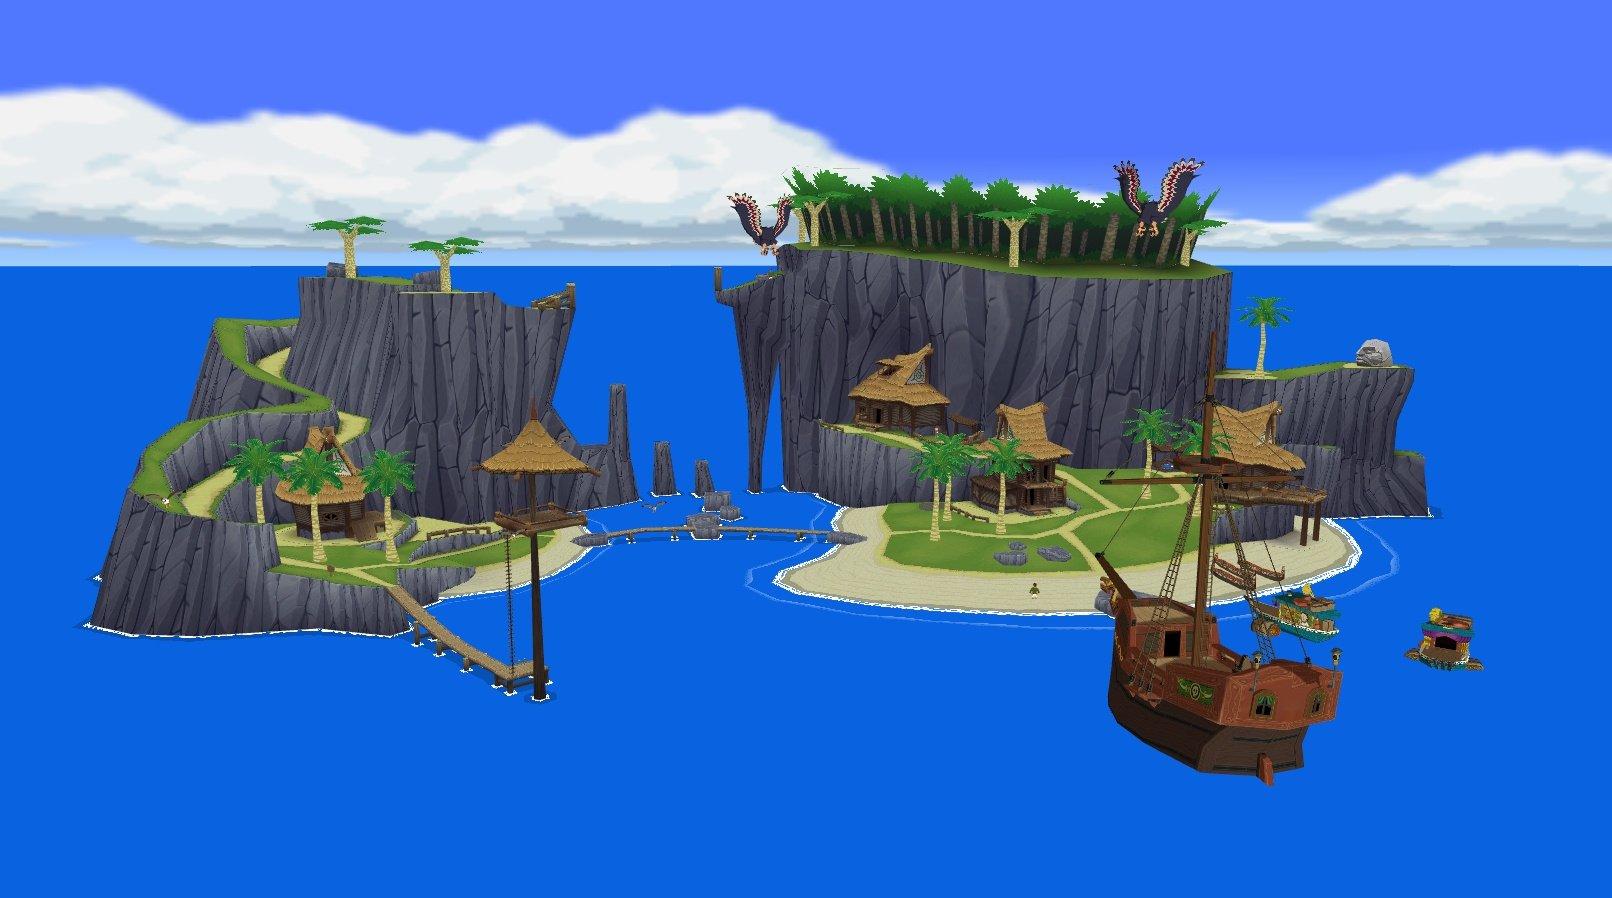 Zelda Wind Waker Karte.Noclip Website Lets You Look At Nintendo Video Game Maps In Your